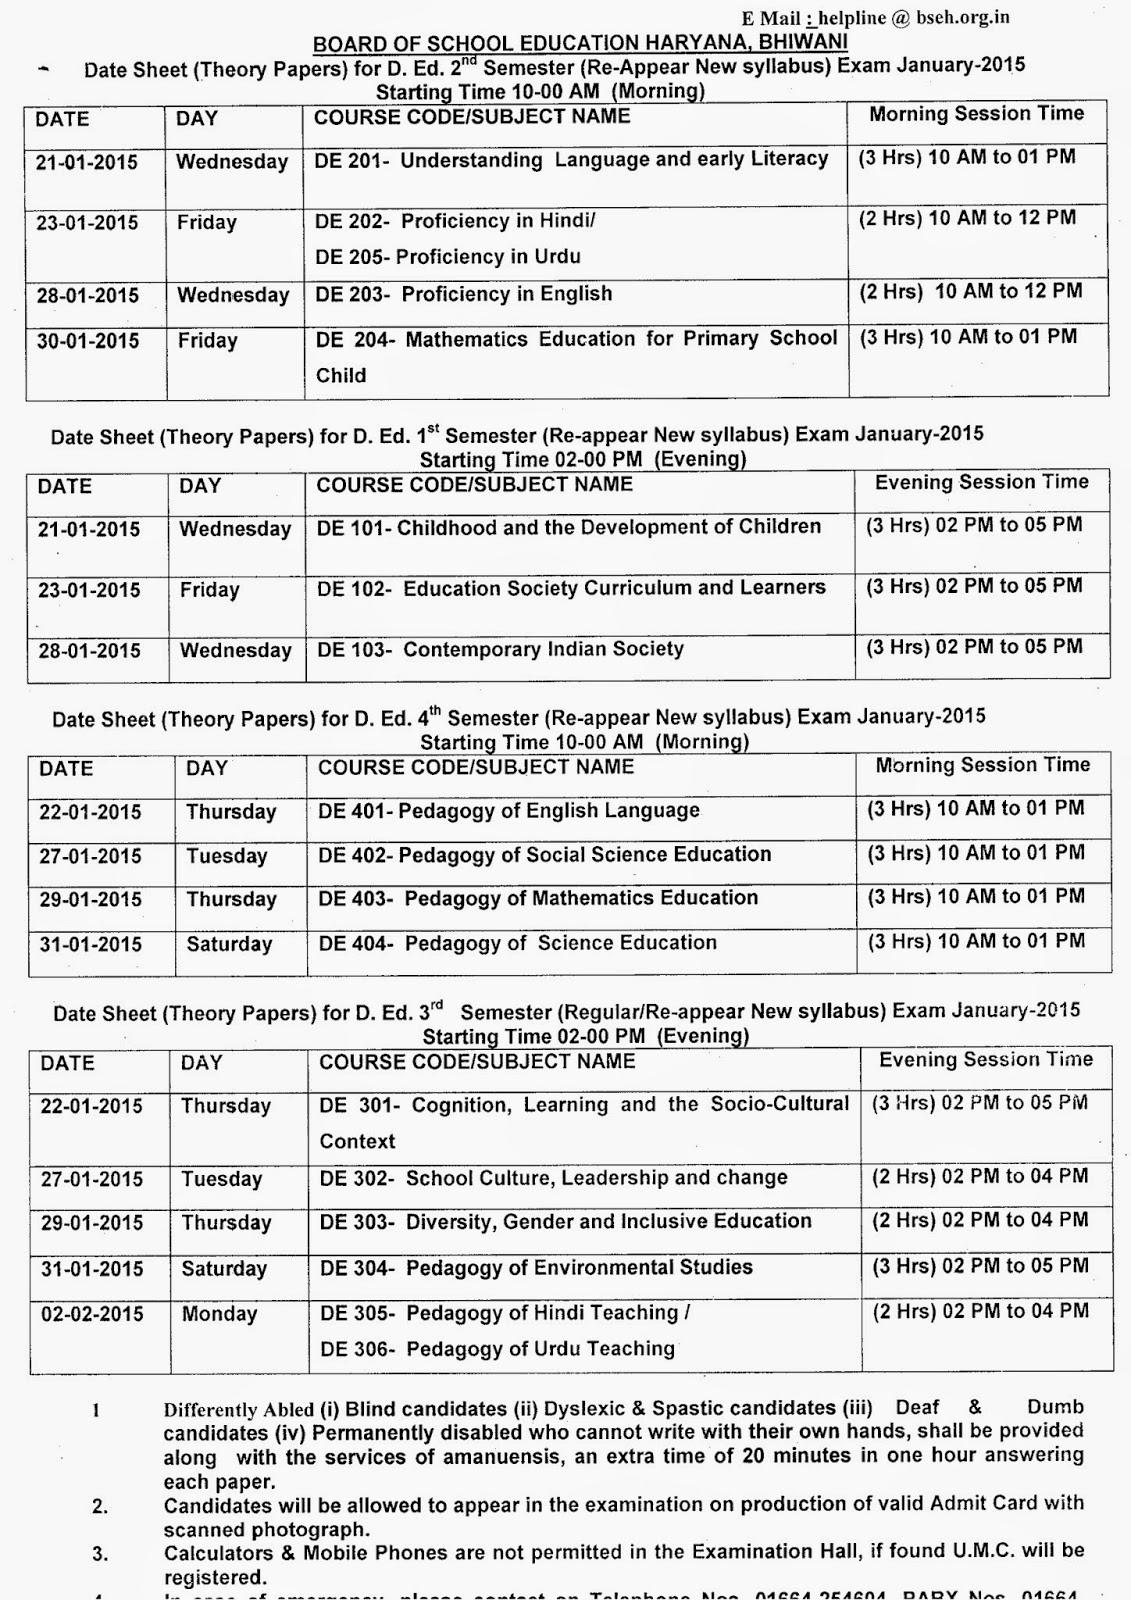 Date-sheet-ded-haryana